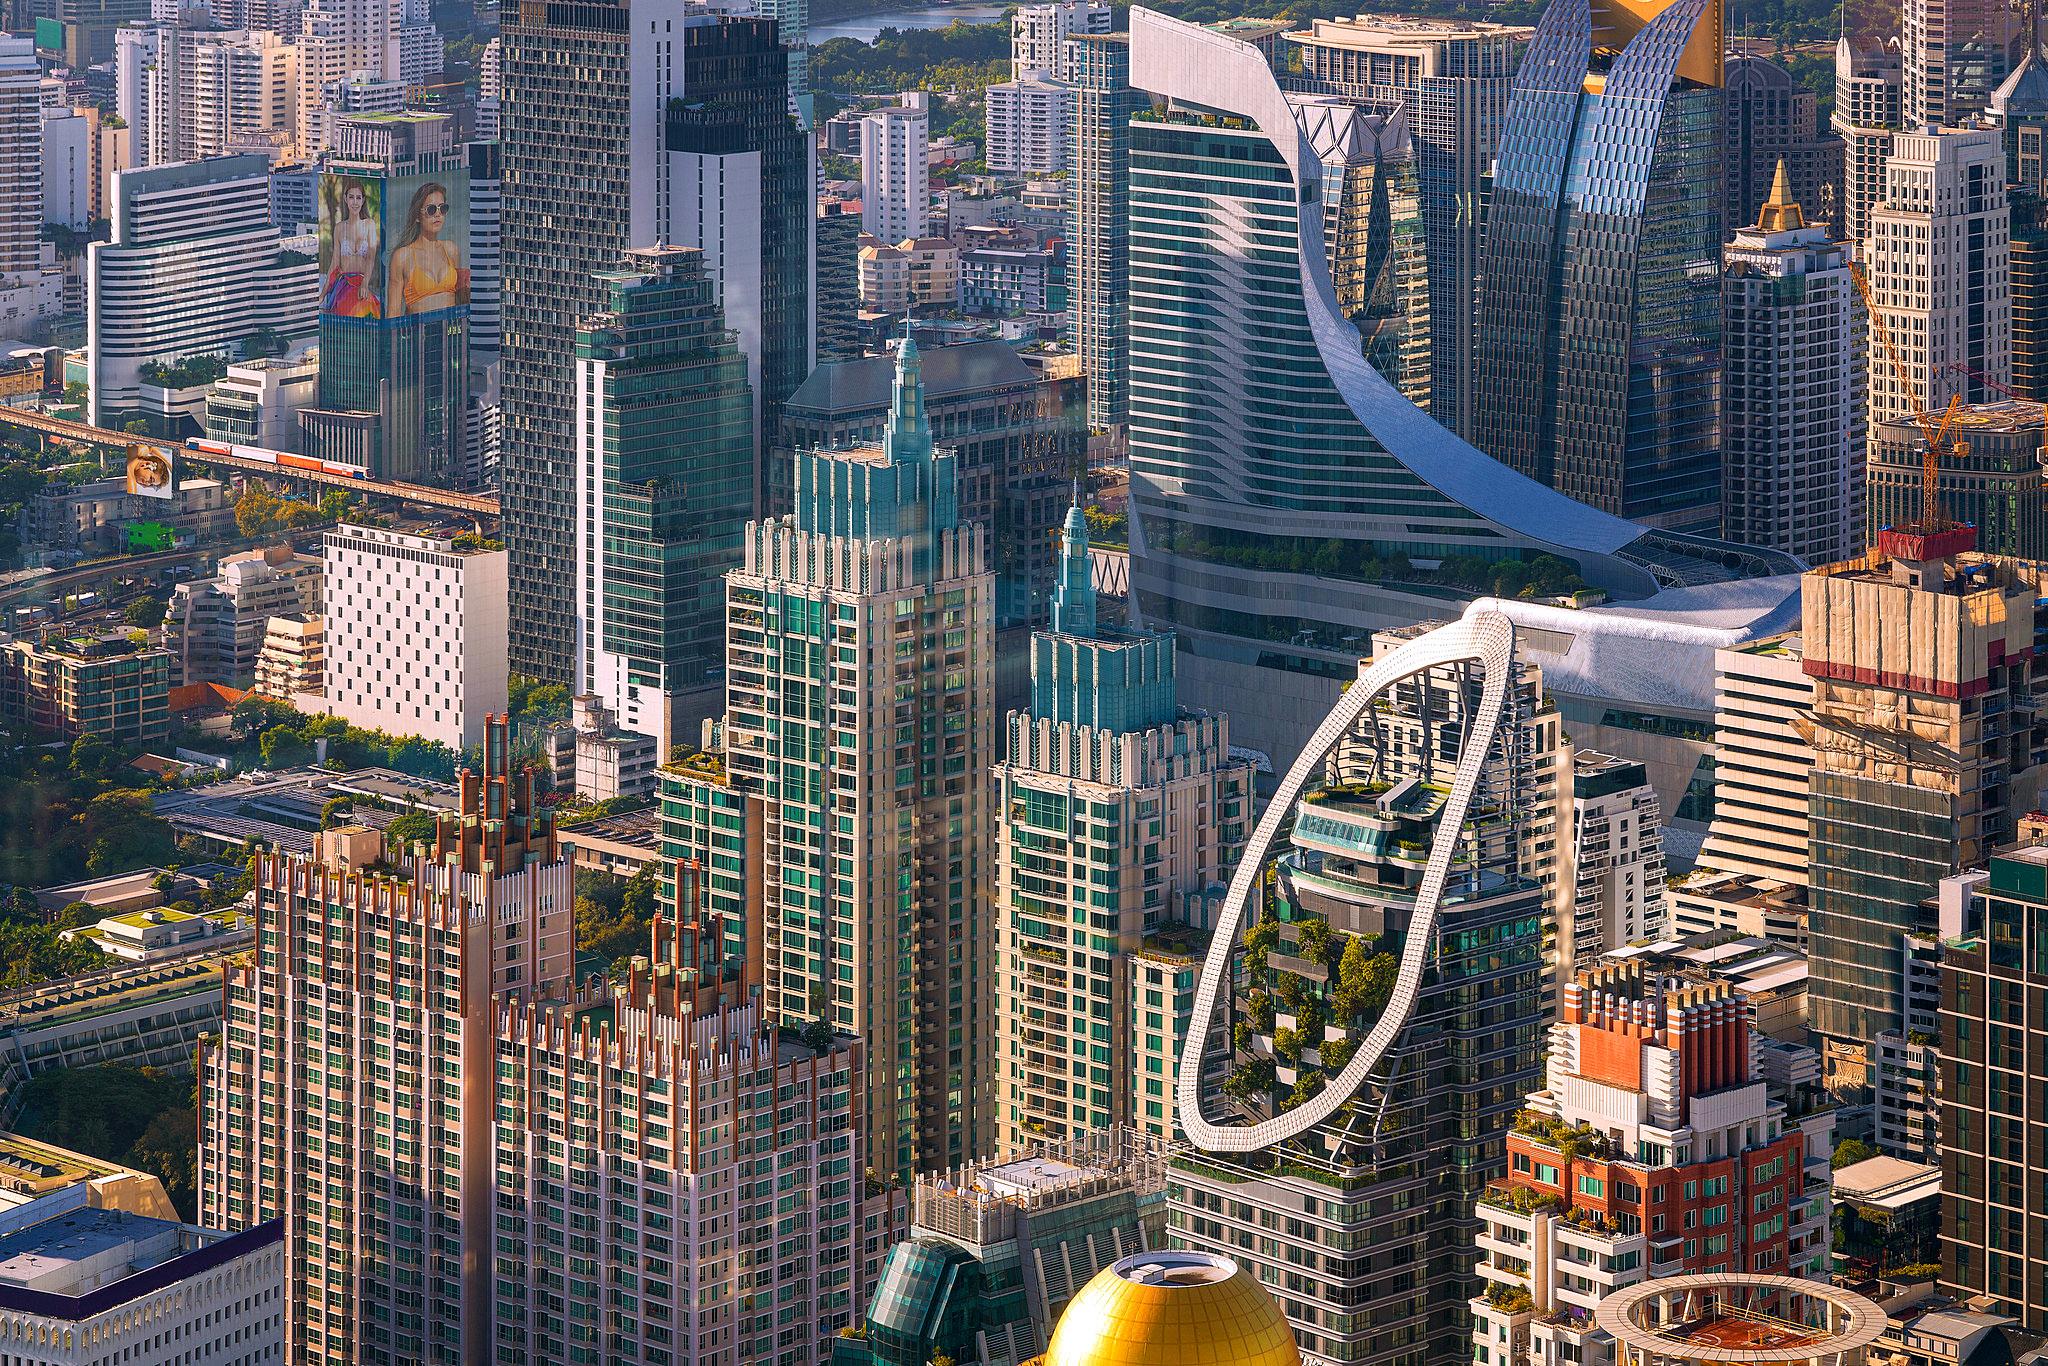 Bangkok 02 by Anek Suwannaphoom.jpg